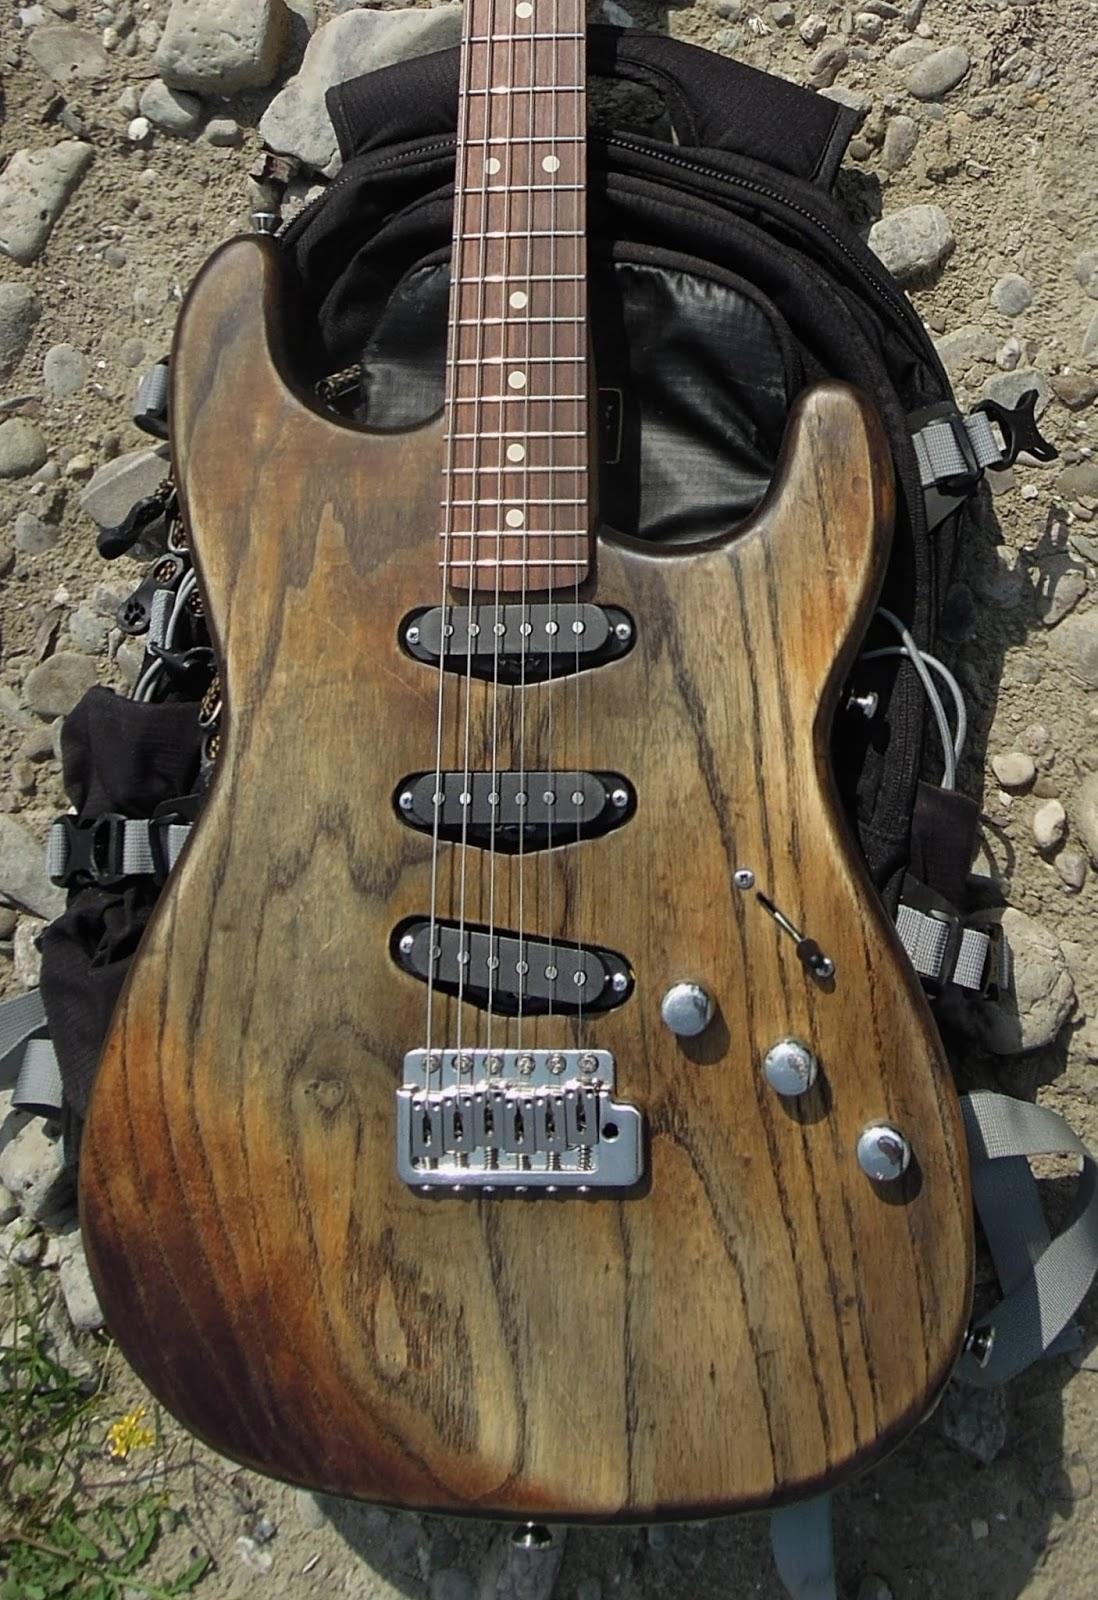 Chet Atkins Gibson Guitar Wiring Diagram Auto Electrical Original U0026 Epiphone Wirirng Diagrams Fretboard Stain